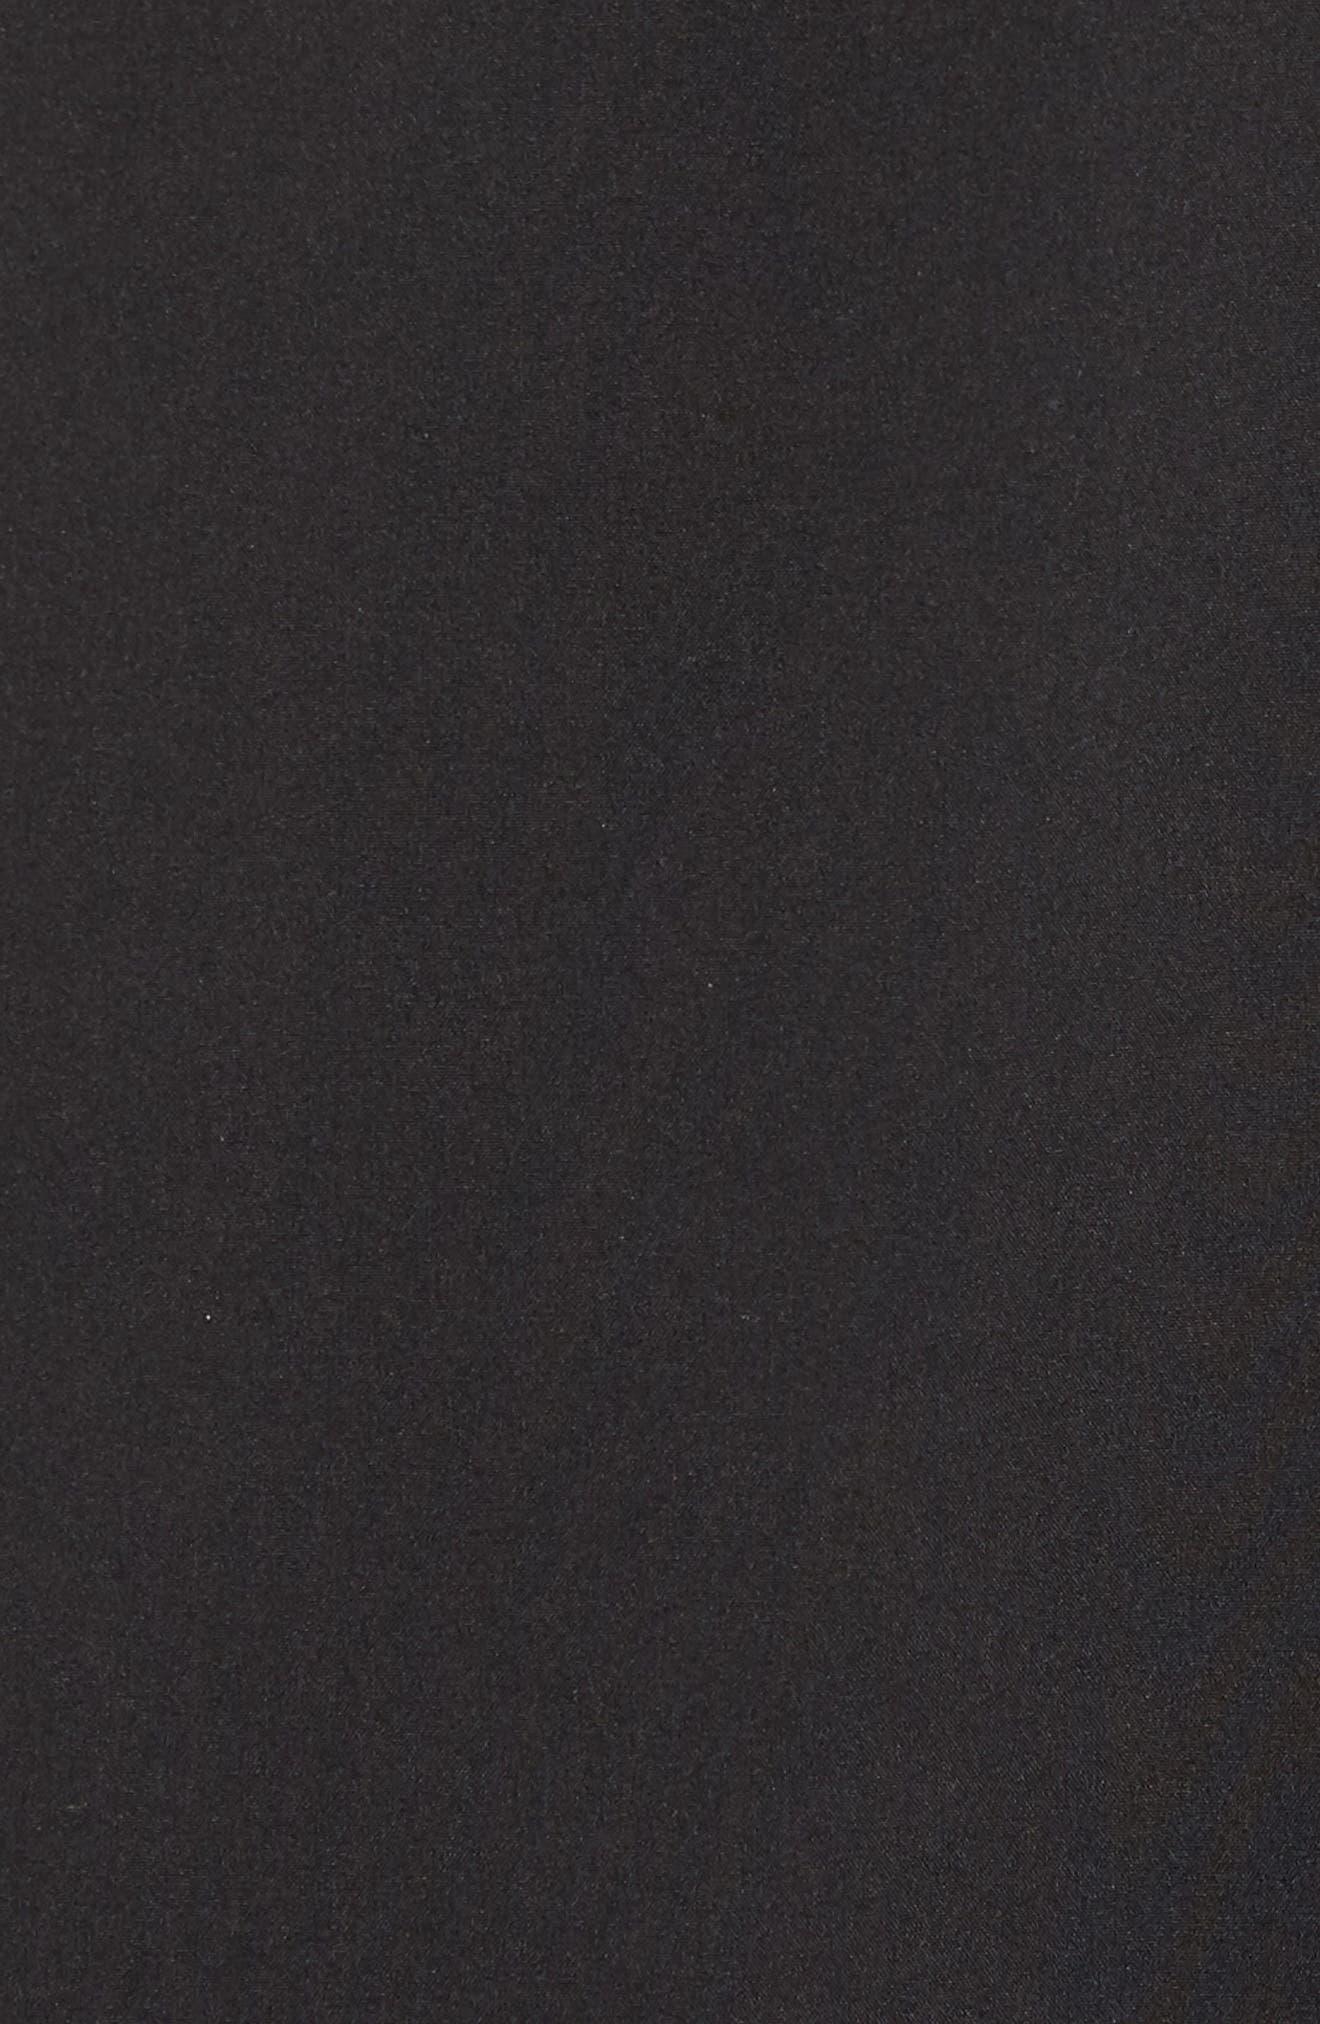 Grindstone Water Repellent Jacket,                             Alternate thumbnail 5, color,                             Black